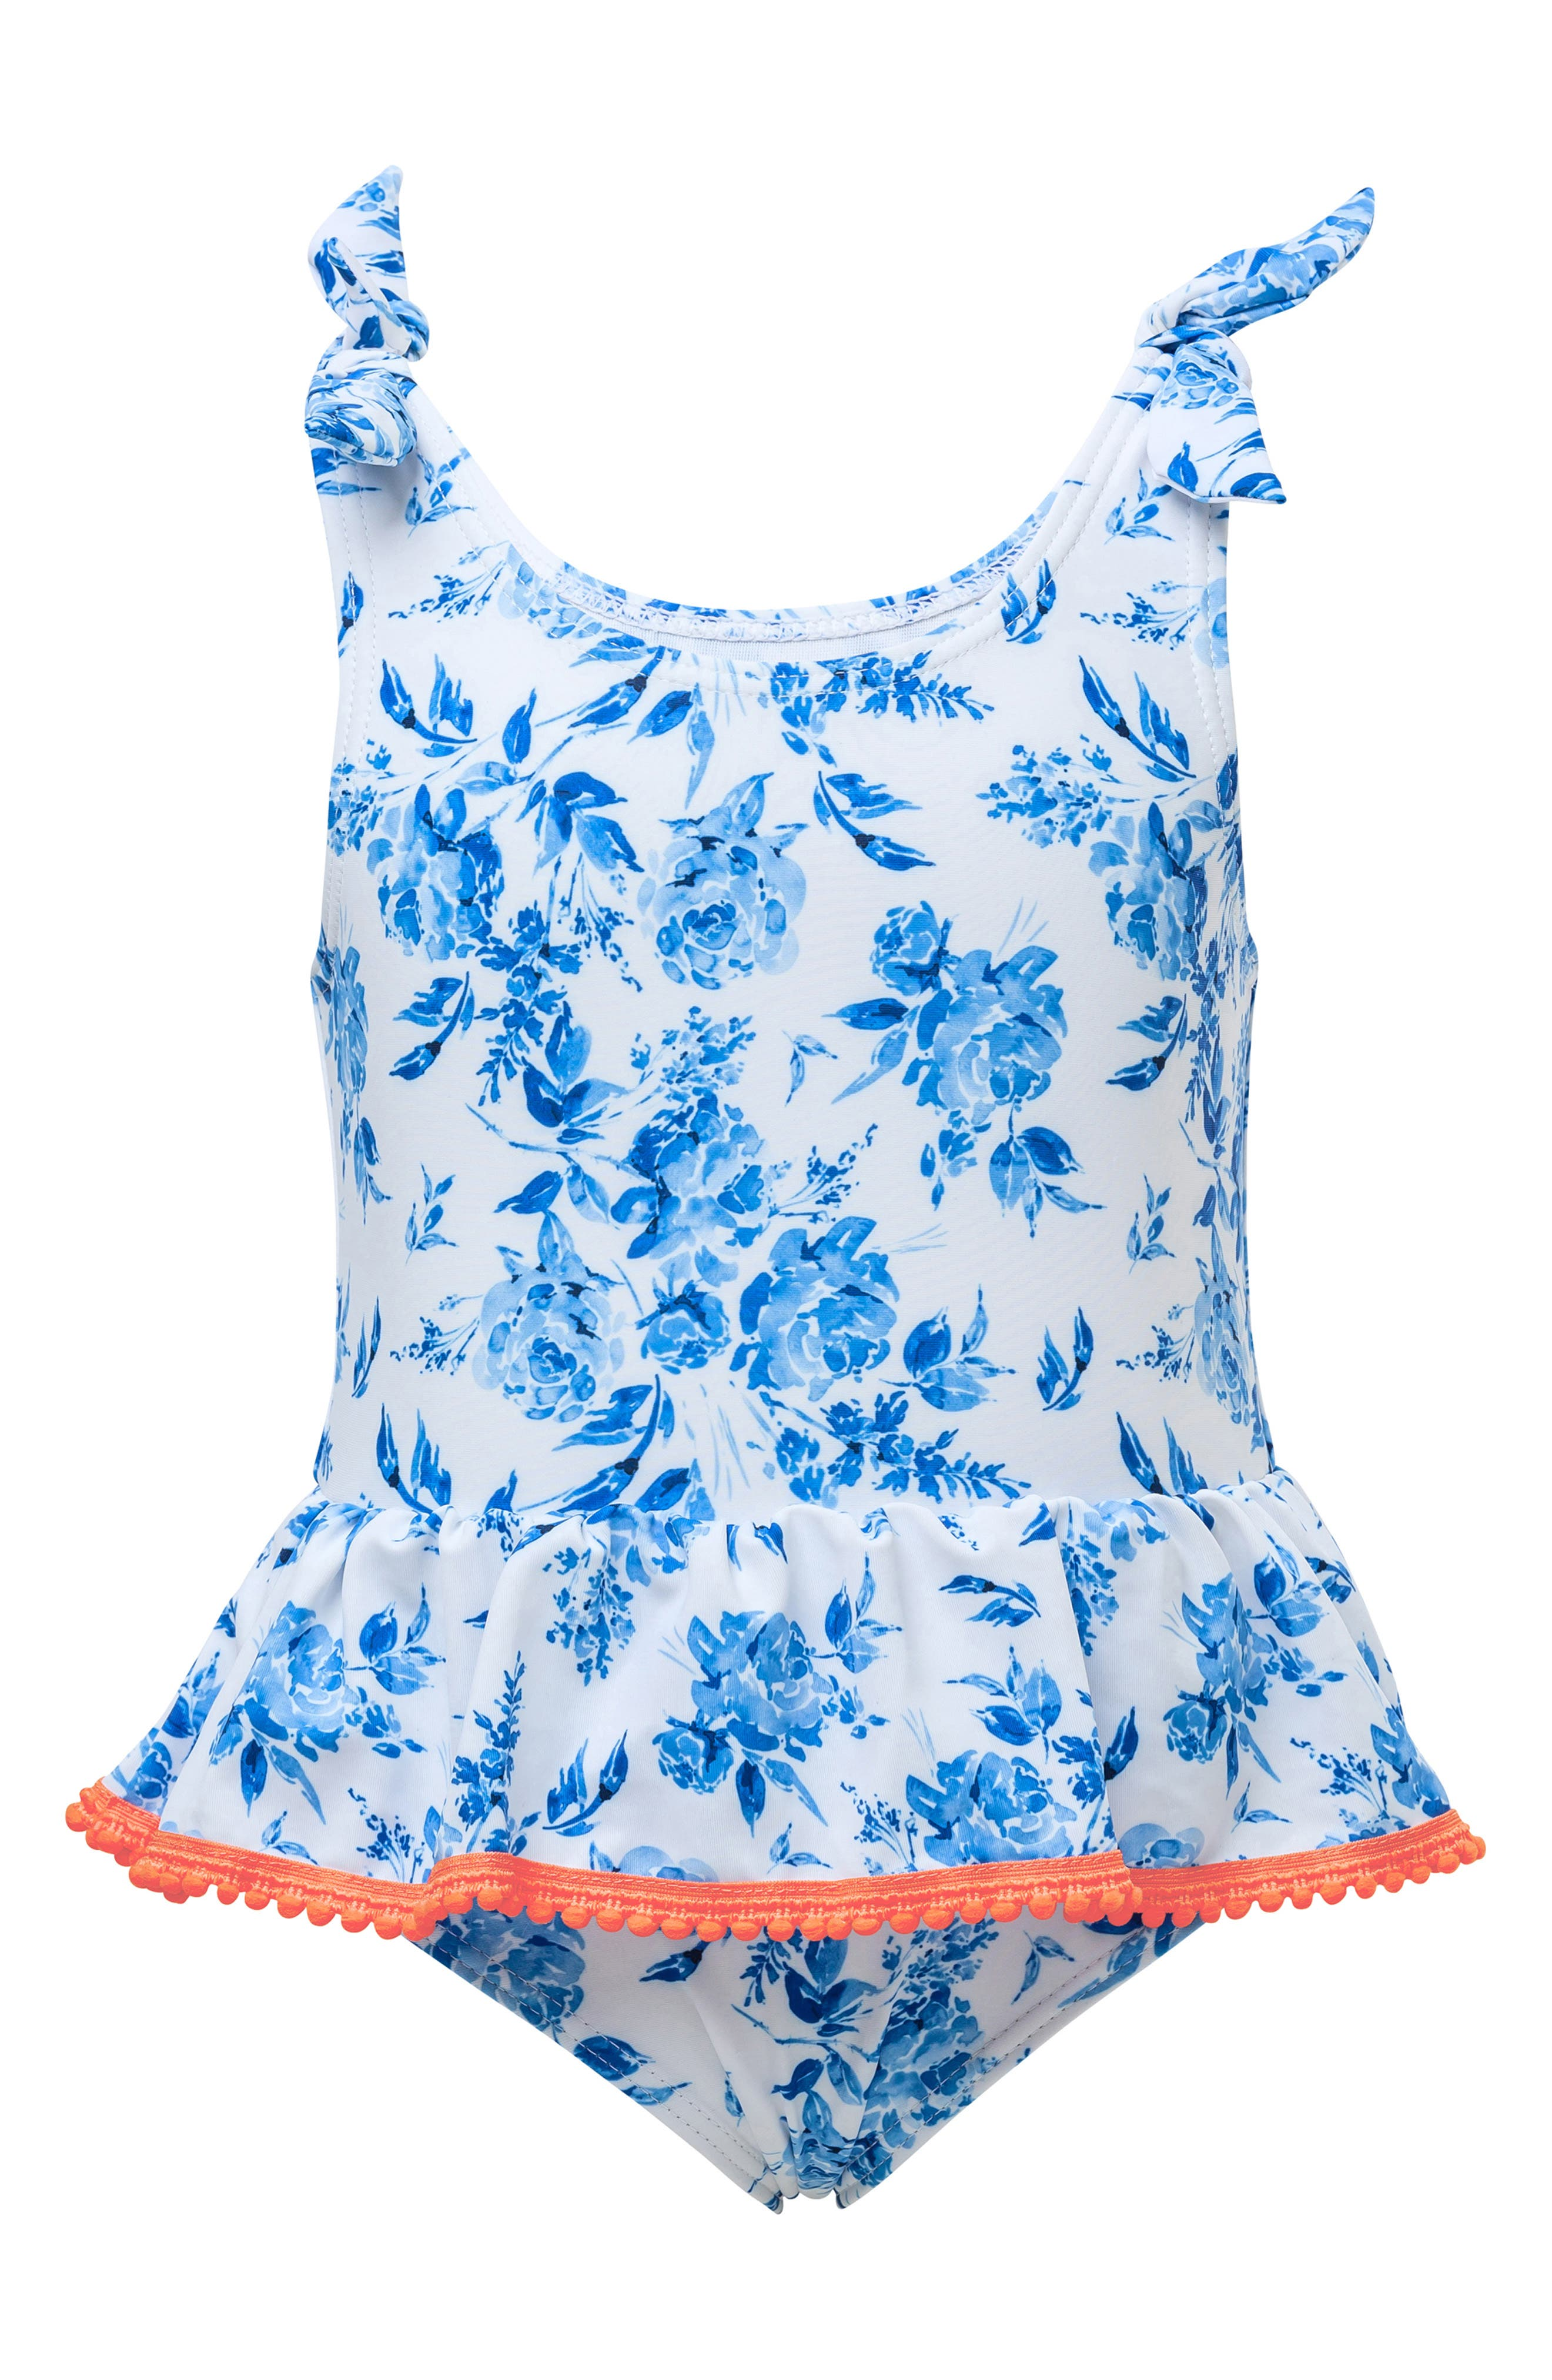 Infant Girls Snapper Rock Cottage Floral OnePiece Swimsuit Size 612M  Blue